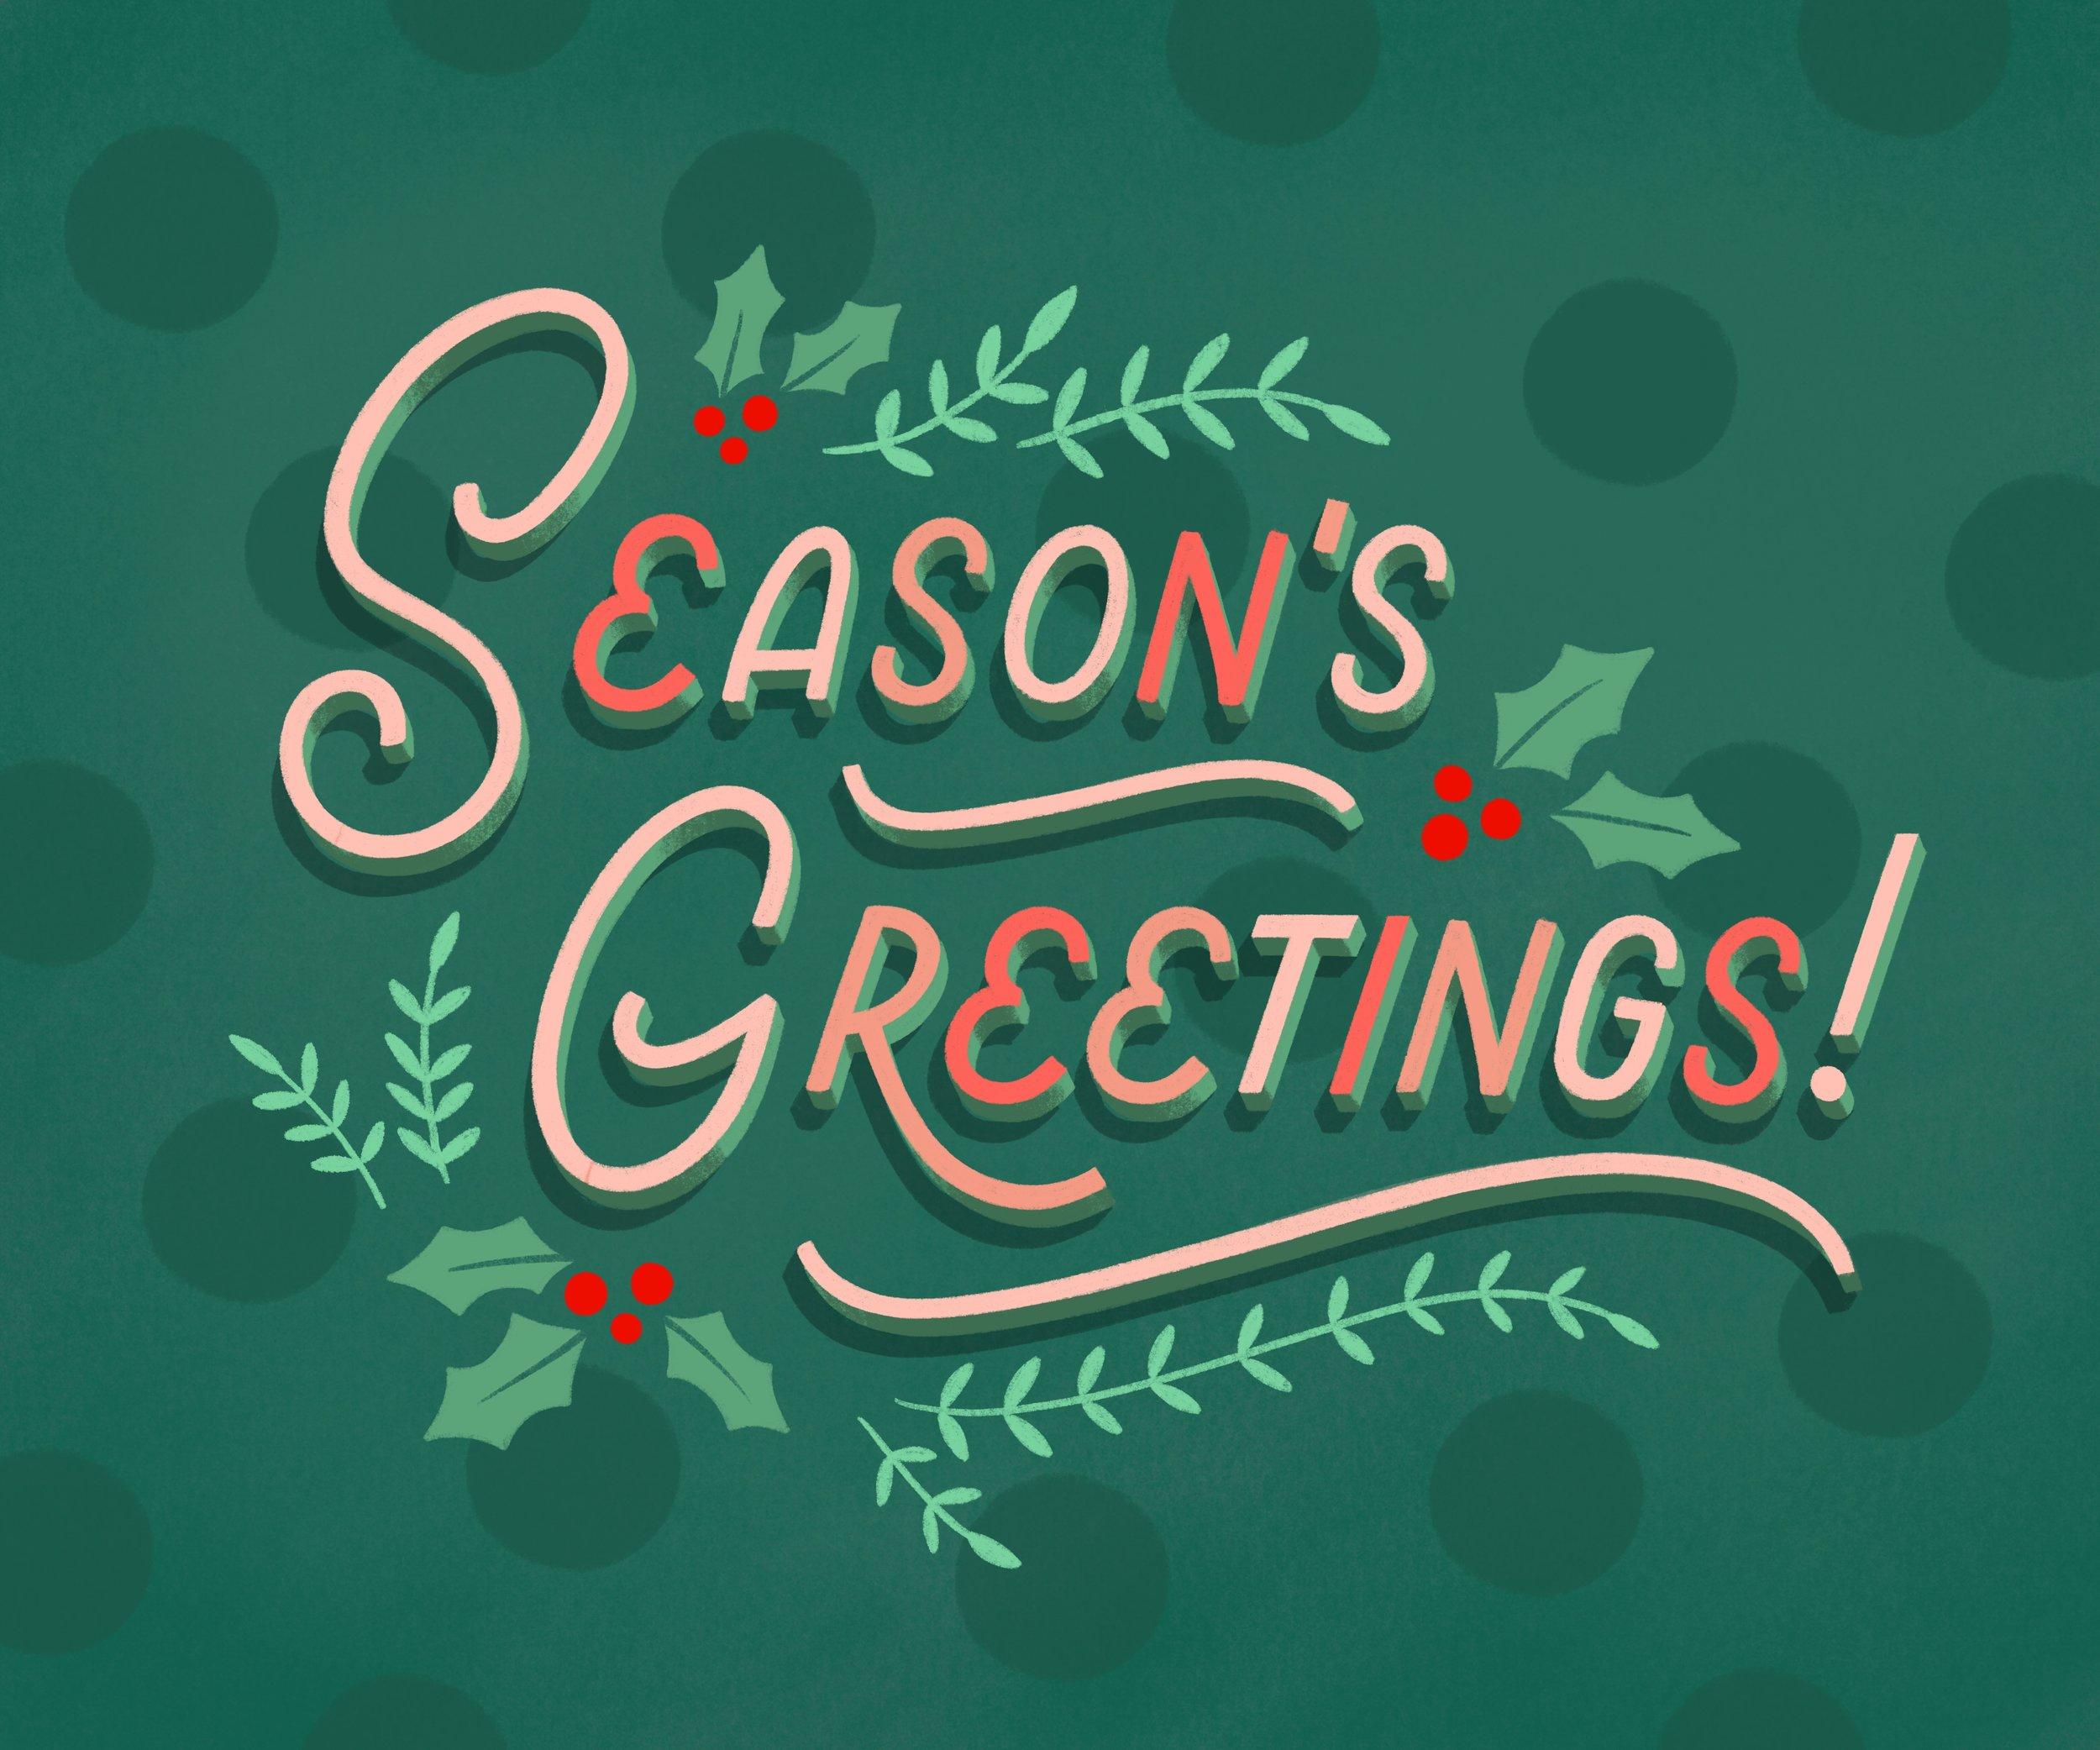 KJ-Christmas_SeasonsGreetingsMultiColor.jpg